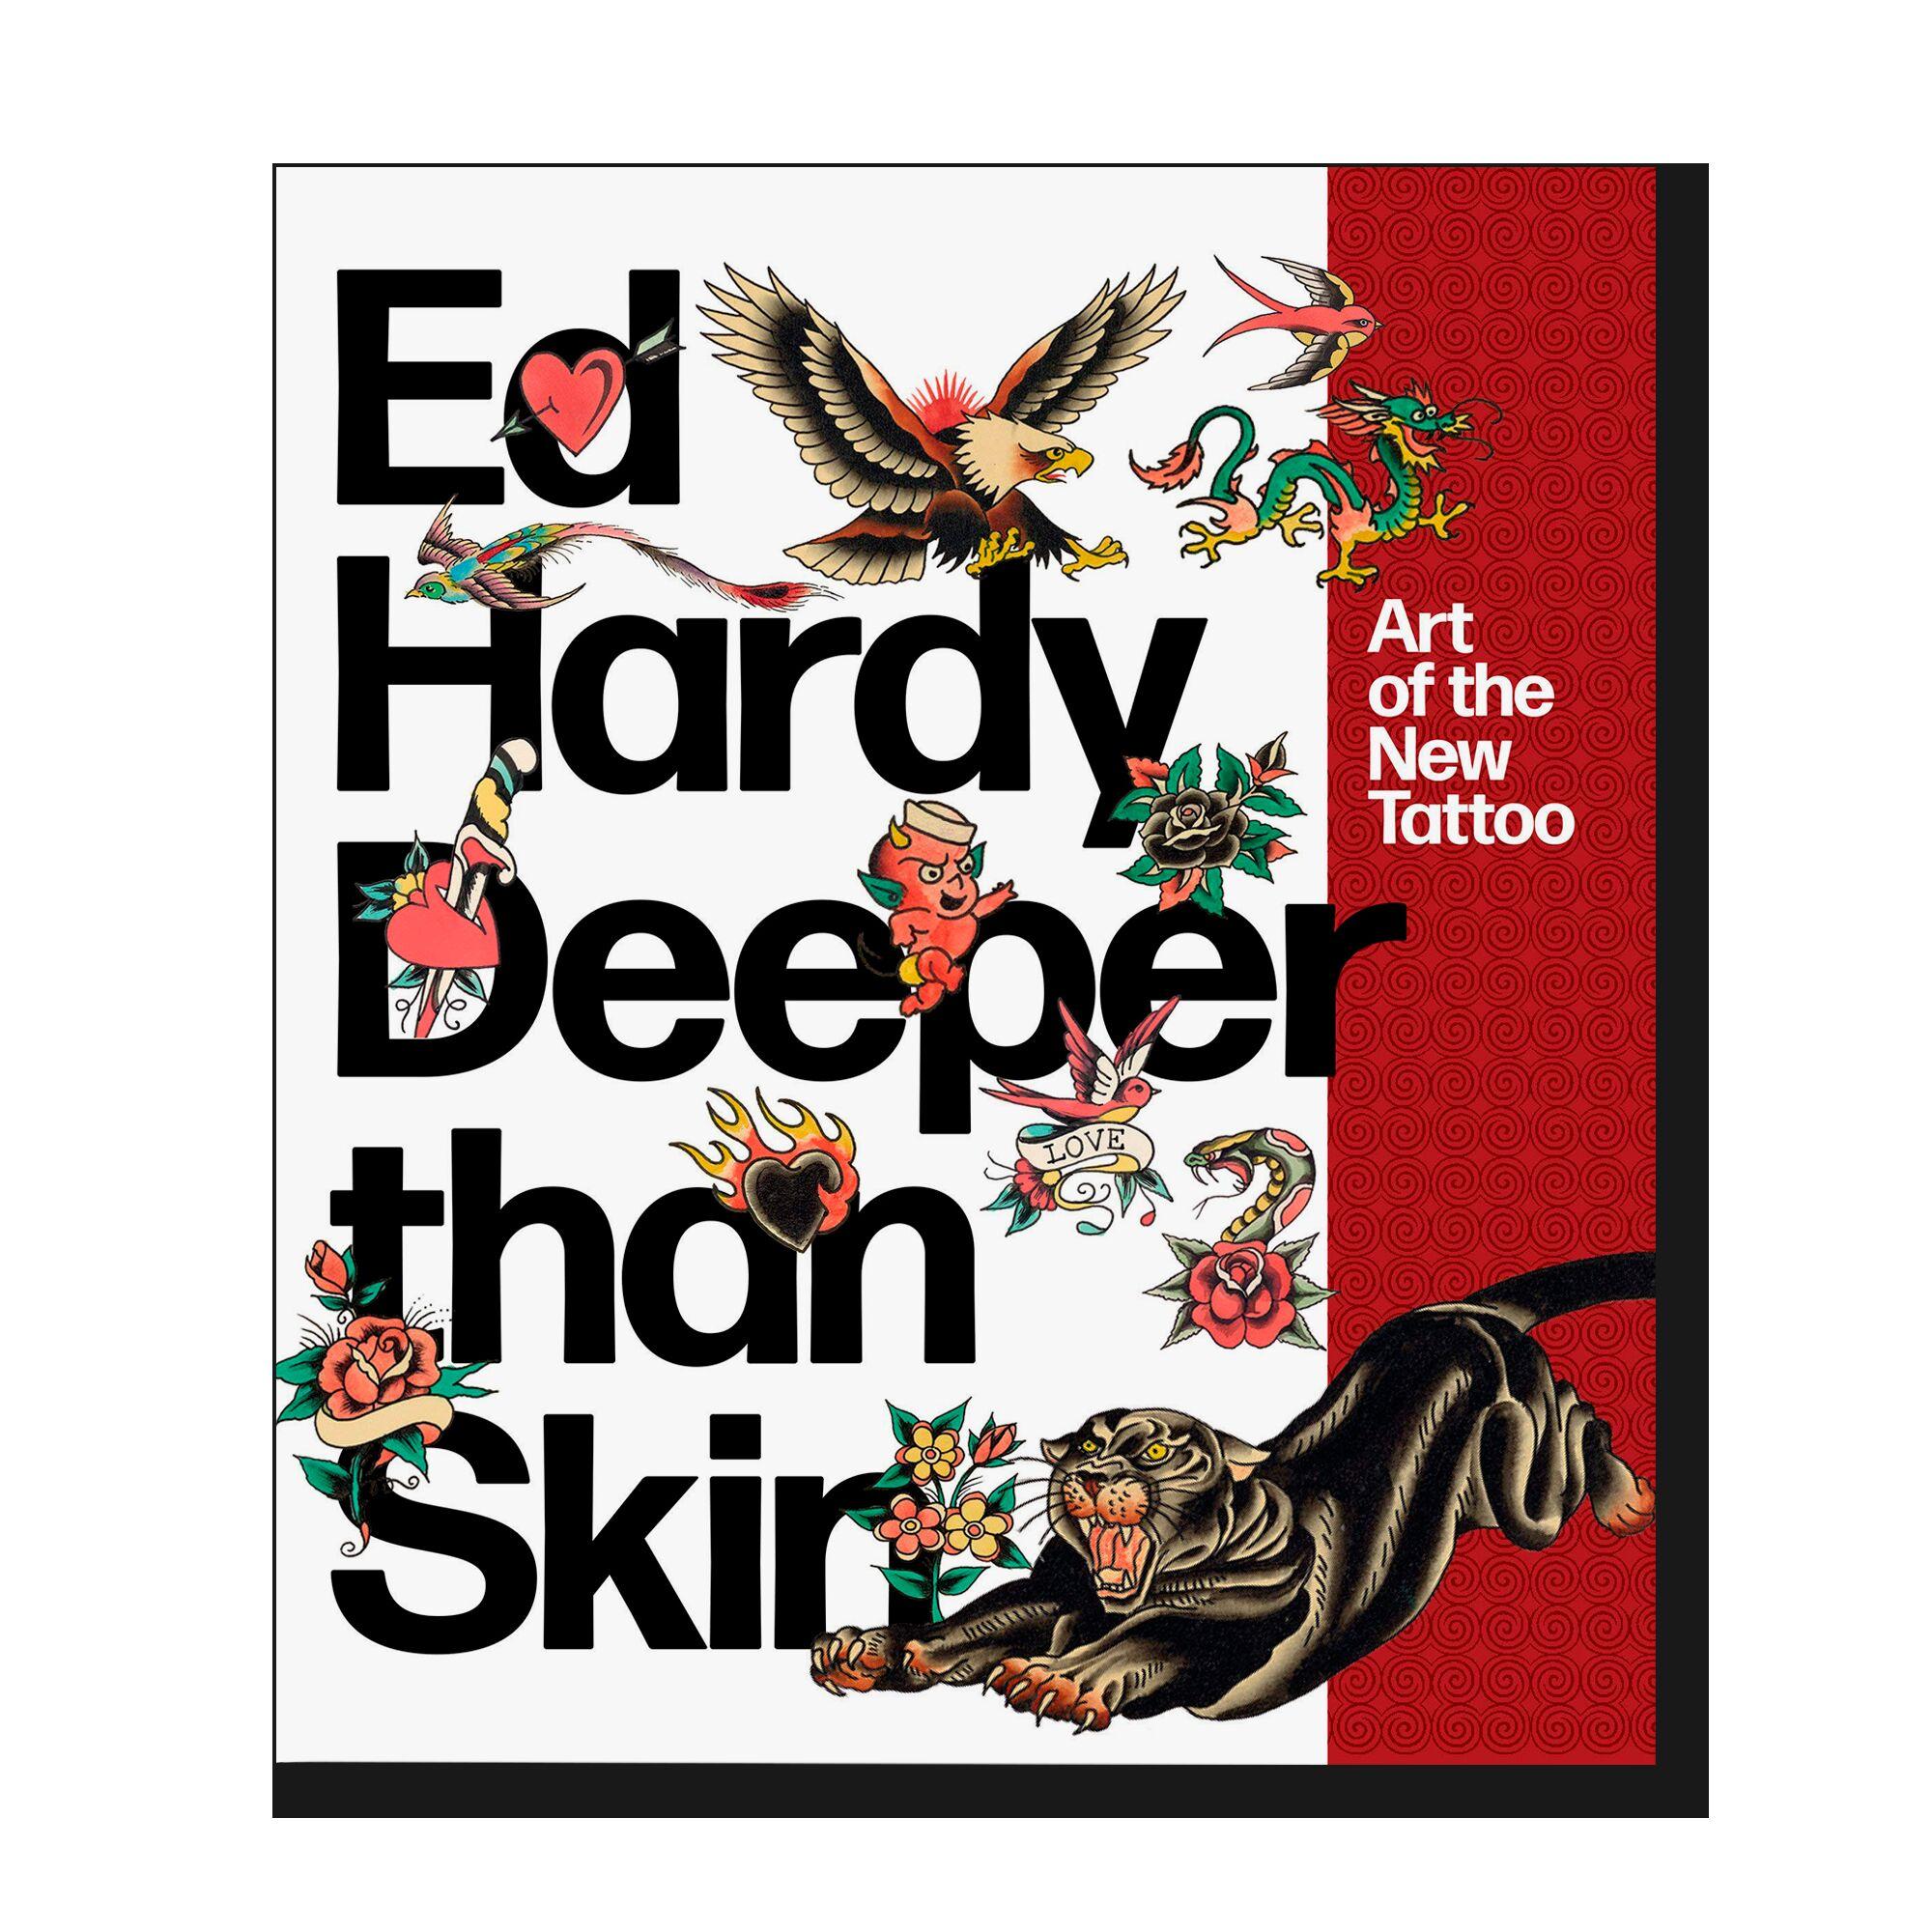 Ed Hardy and the Tattoo Renaissance